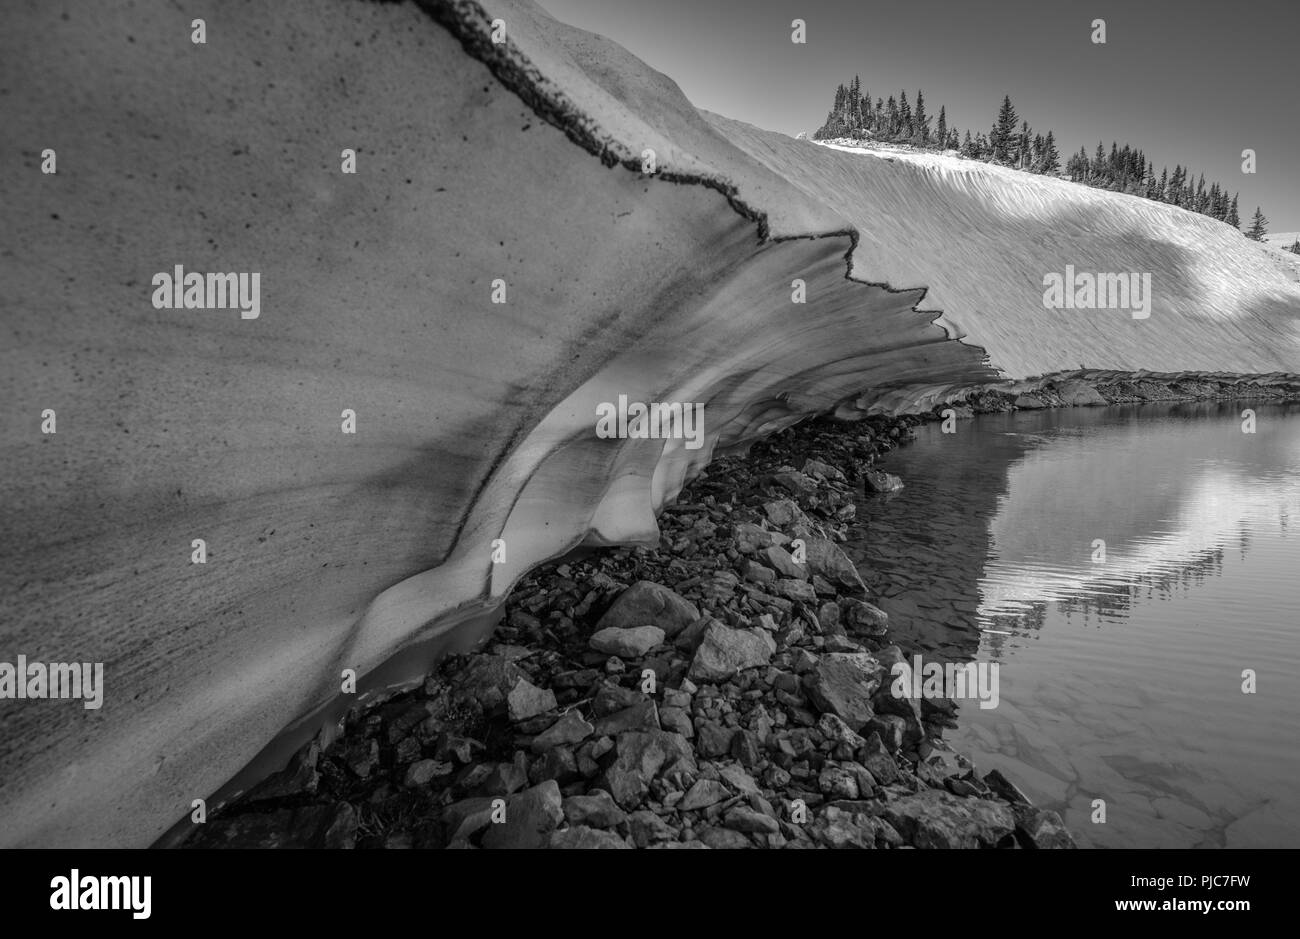 Brewster Lake, Gros Ventre Wilderness, Wyoming - Stock Image